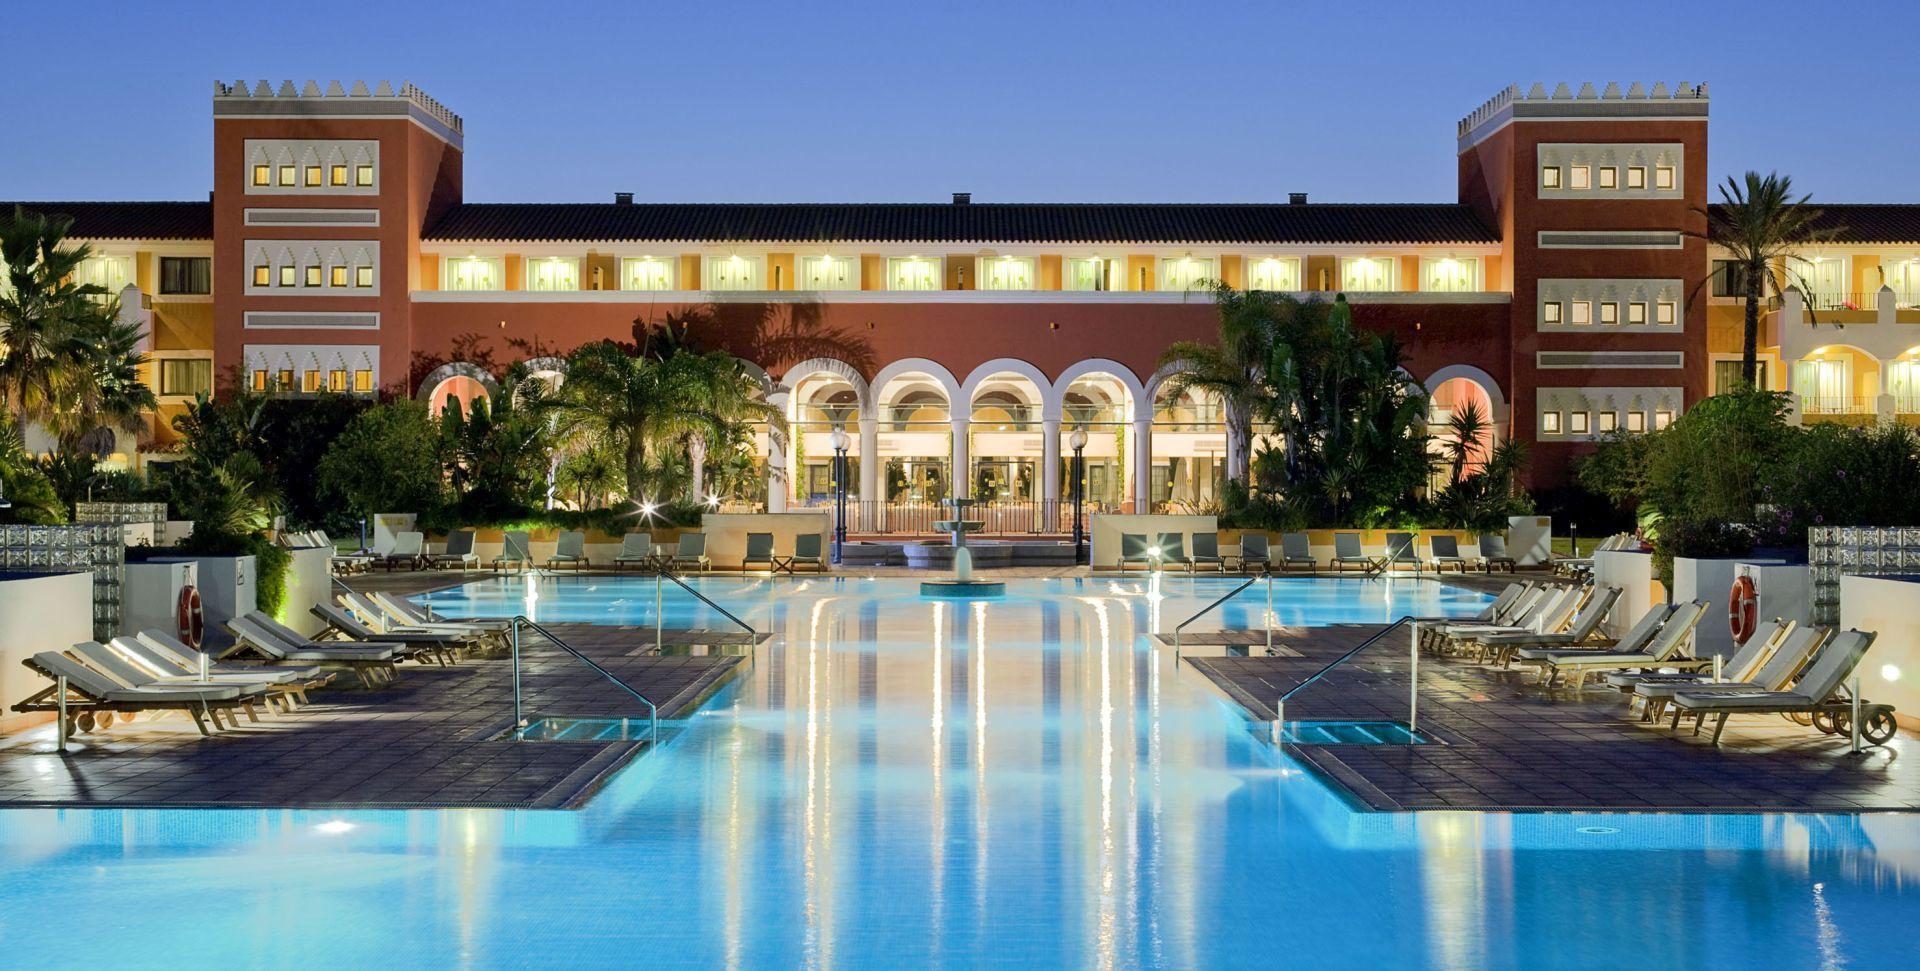 Melia Hotels Kontakt Deutschland